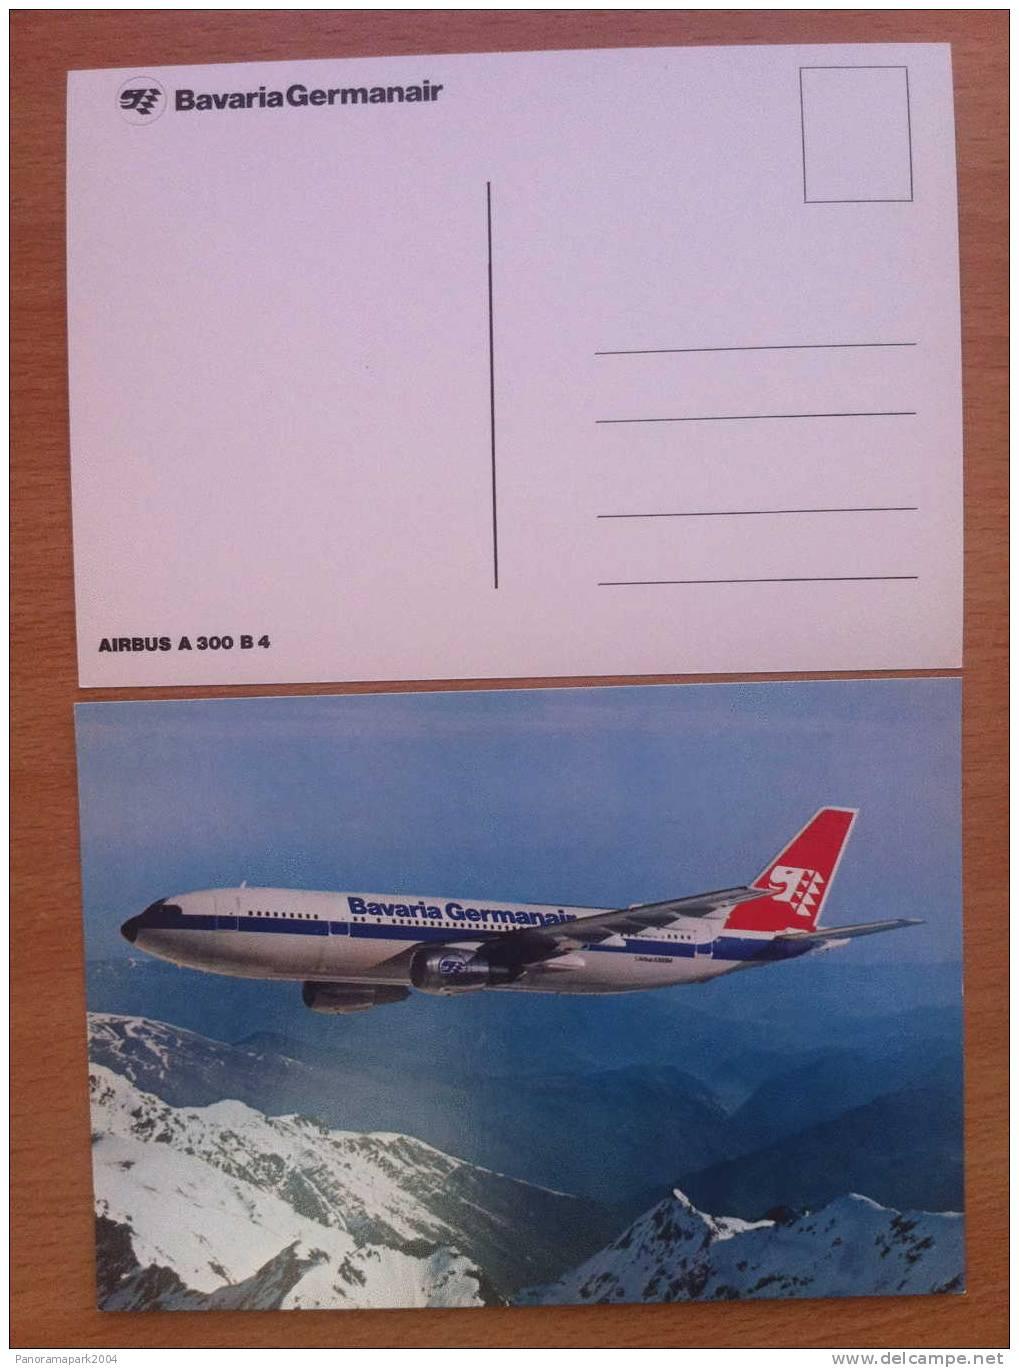 FRANCE CARTE POSTALE BAVARIA GERMANAIR AIRBUS A300 B4 AVION PLANE FLUGZEUG - 1946-....: Modern Era